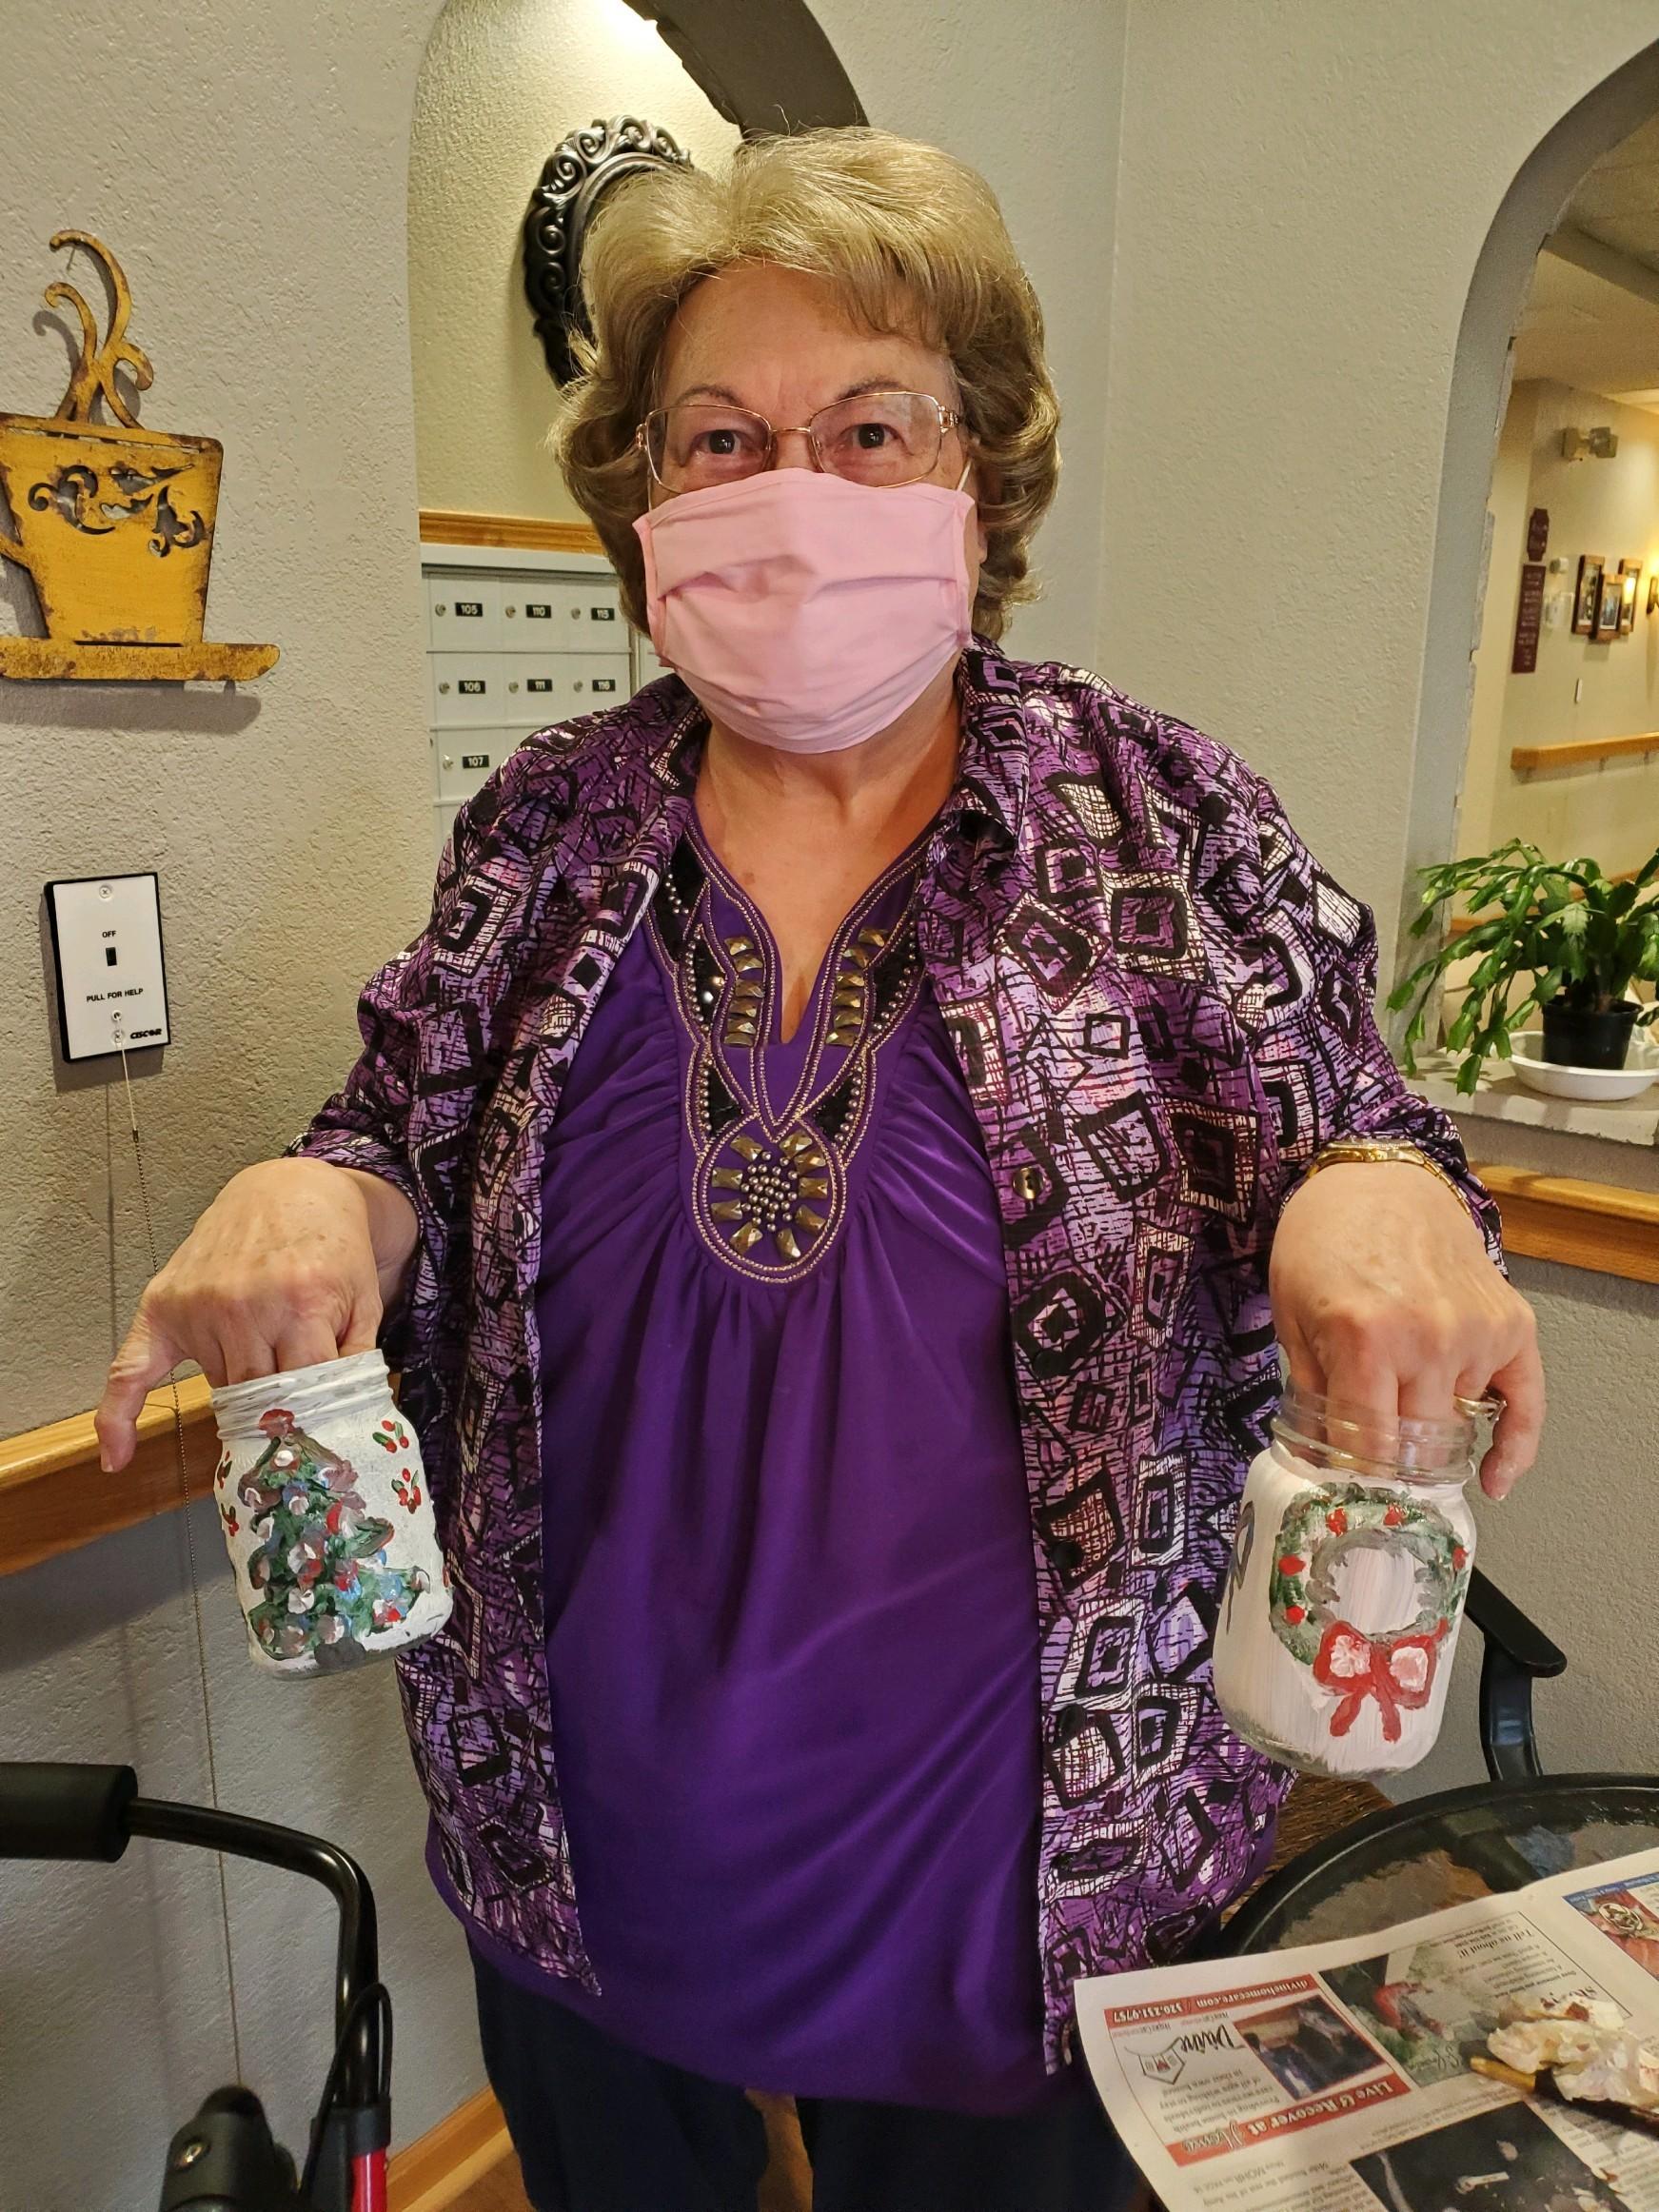 Mary painting Mason jars for National Mason Jar day!